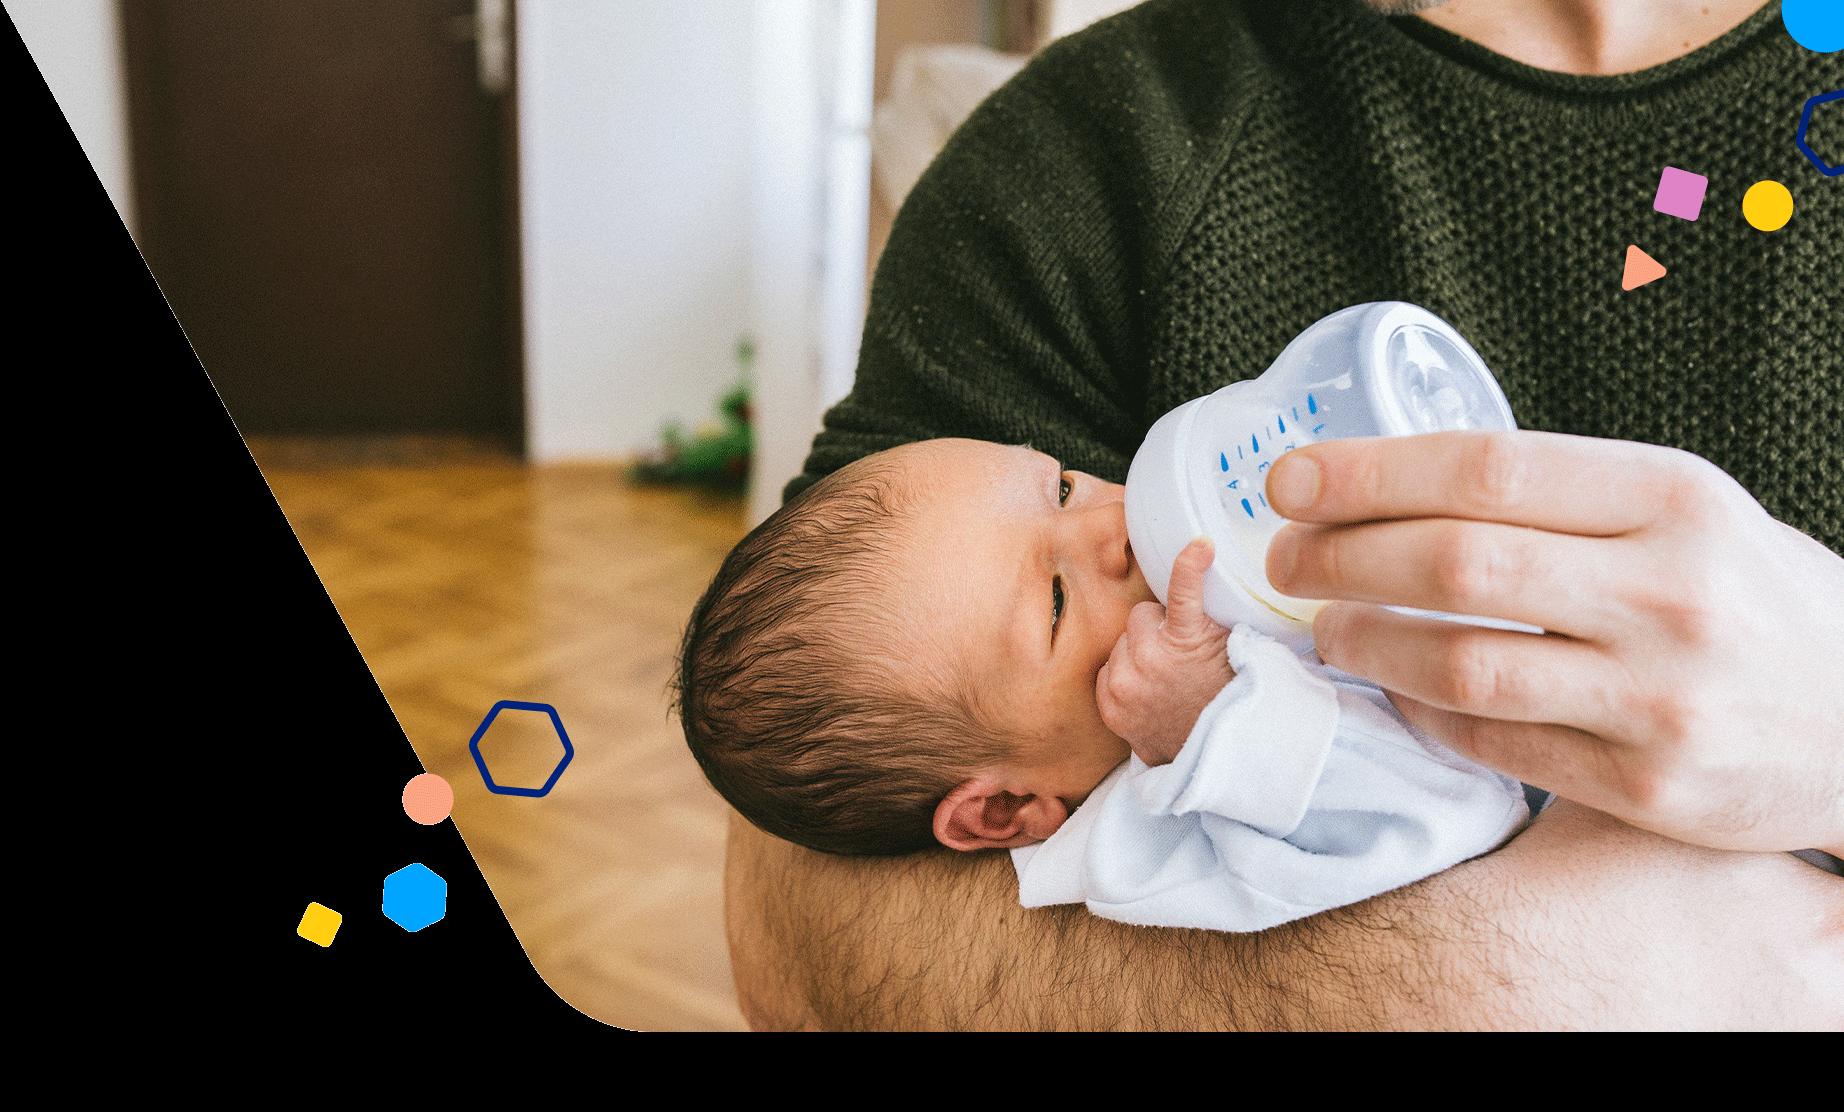 Alternative European Baby Formula Enfamil PREMIUM A2